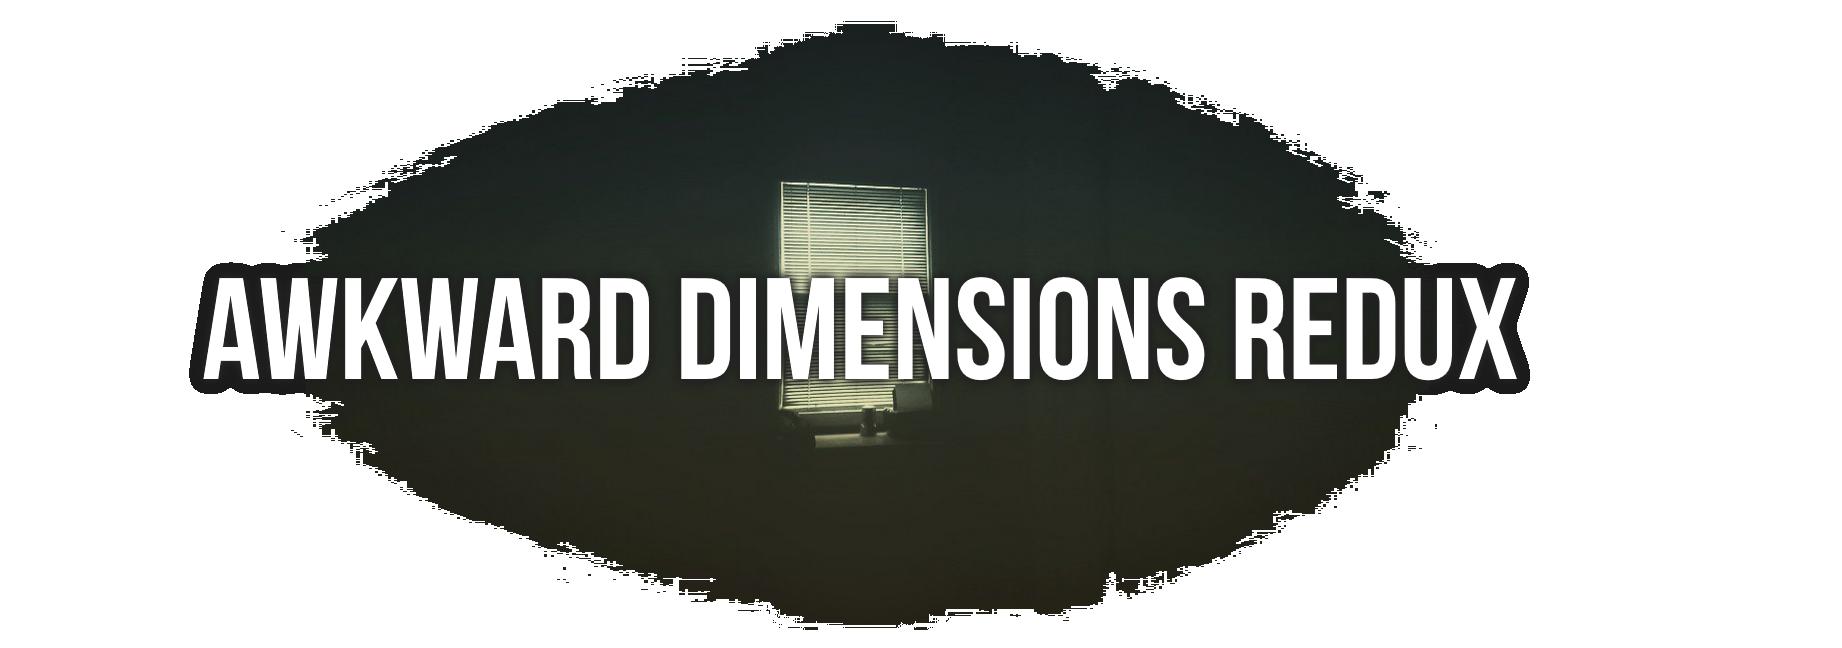 Awkward Dimensions Redux by StevenHarmonGames